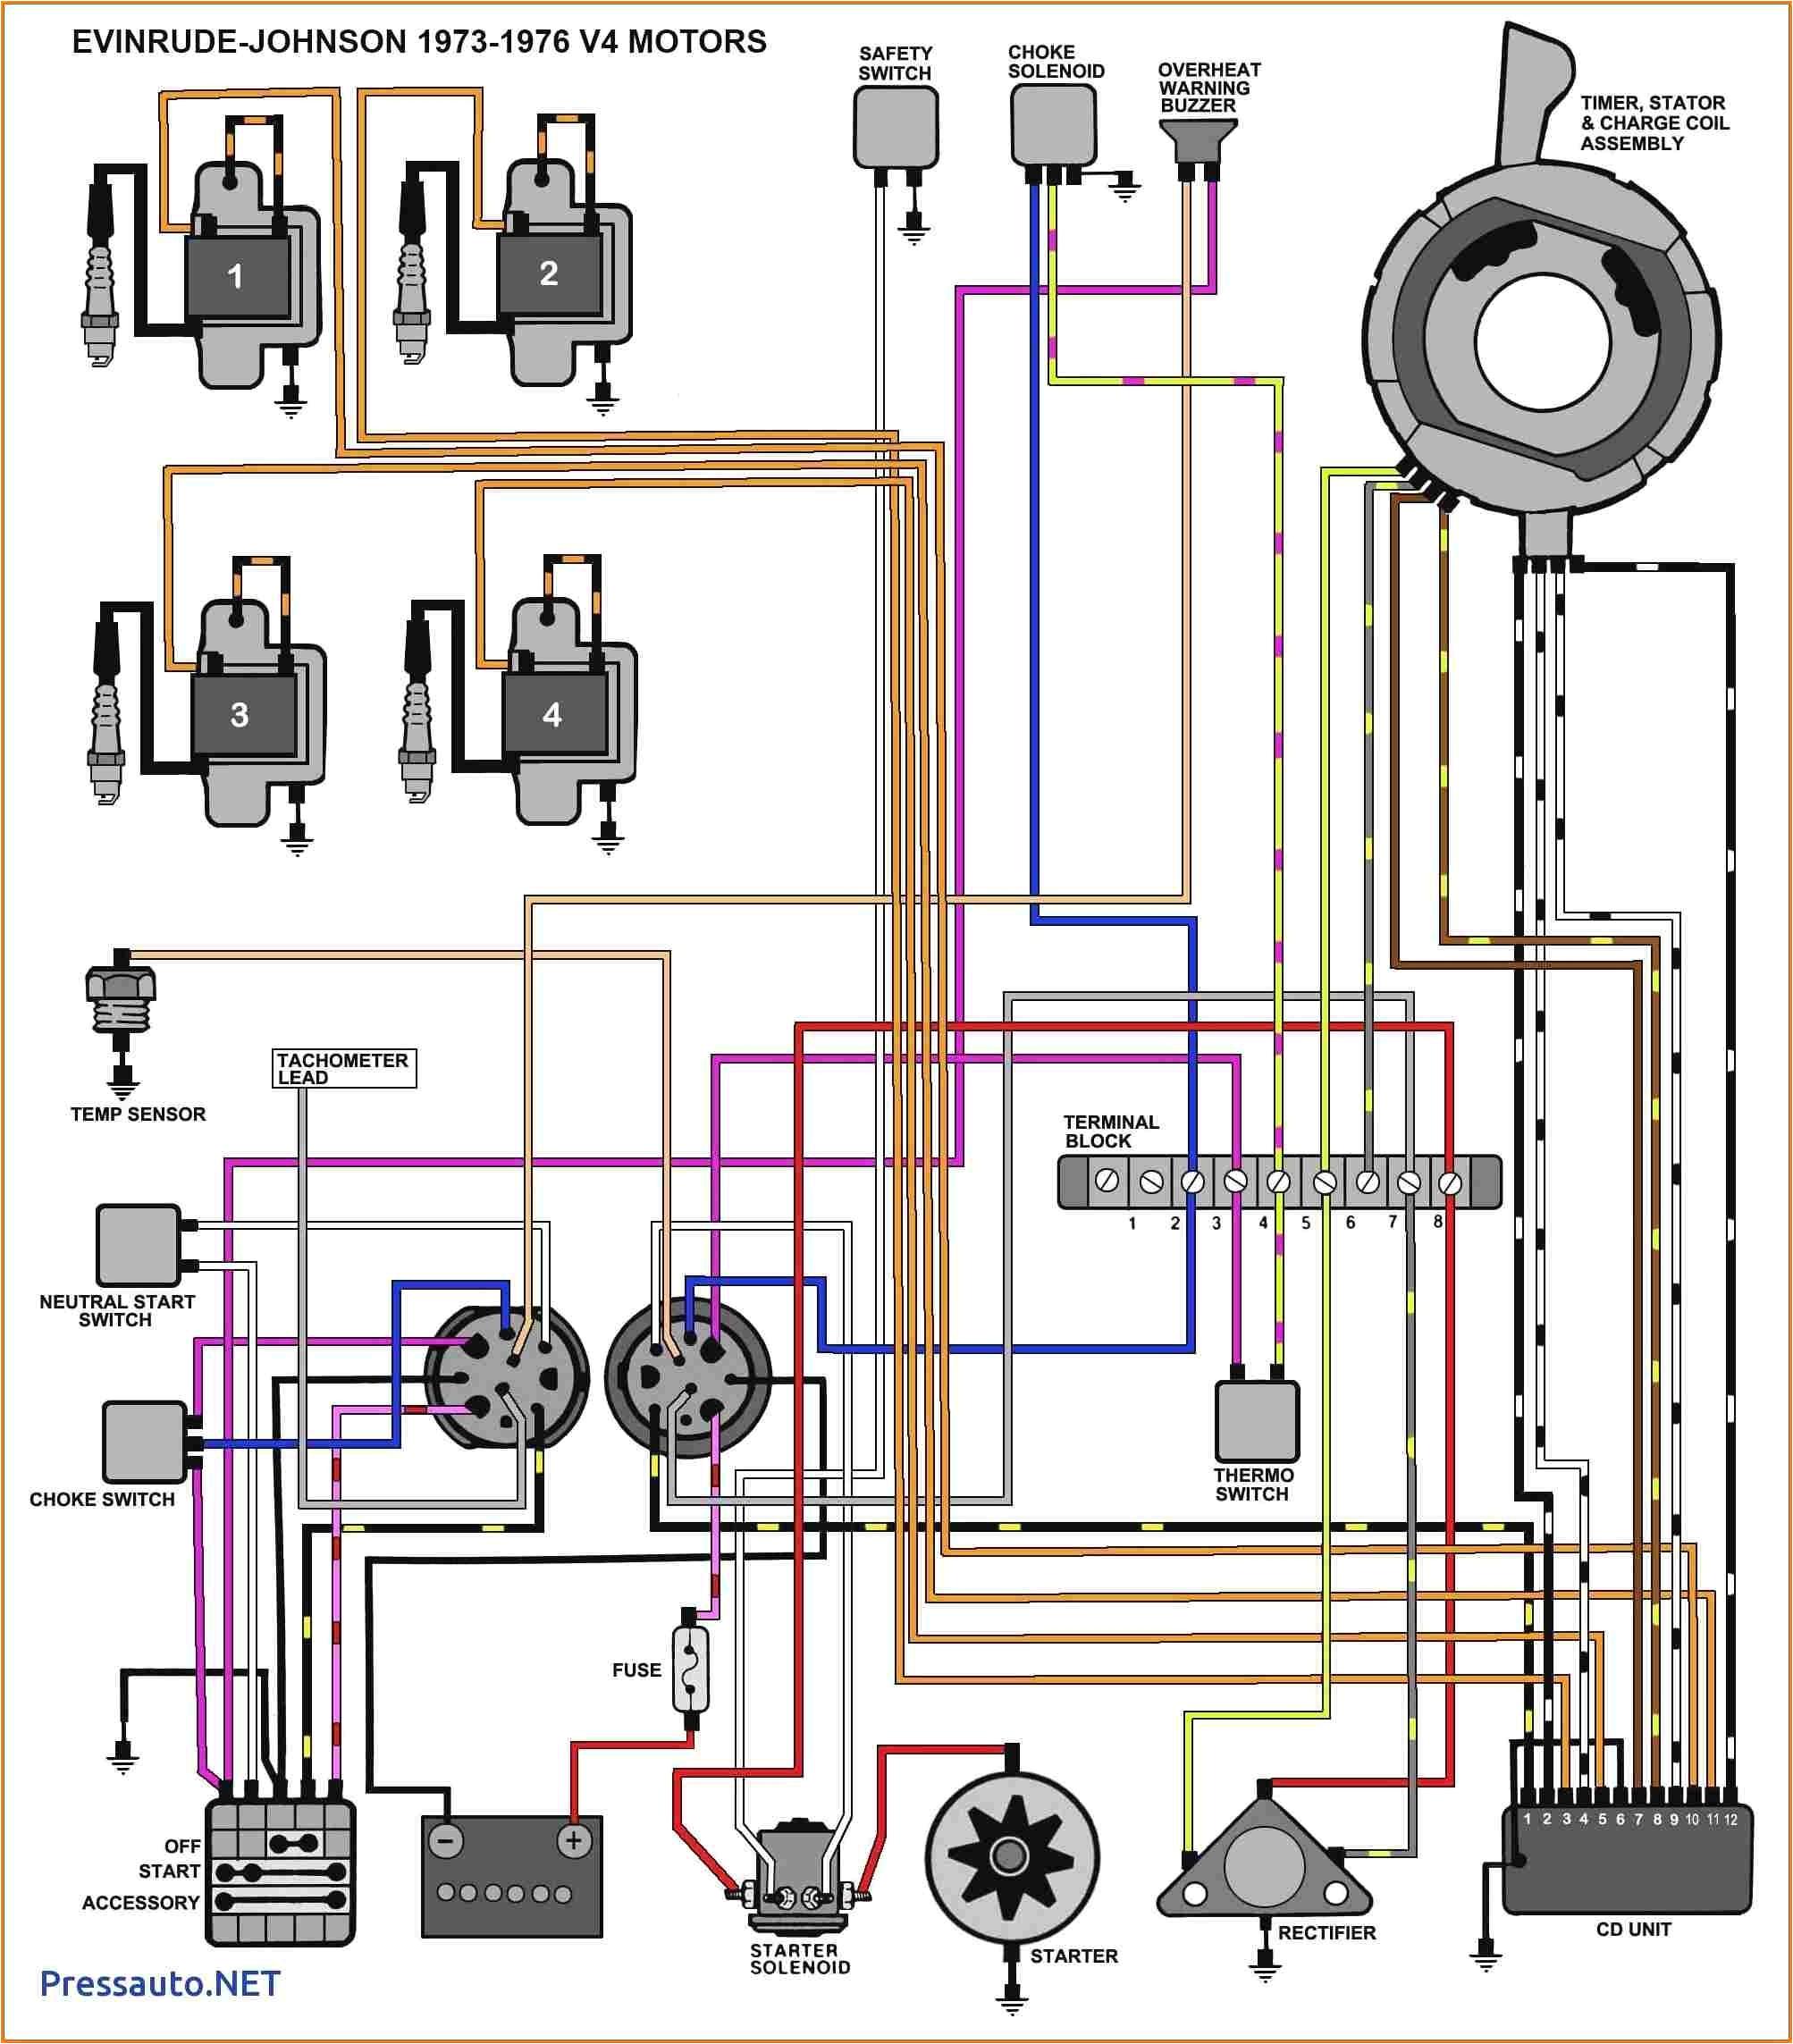 yamaha wiring harness diagram wiring diagram files wiring yamaha outboard yamaha outboard main engine wiring harness